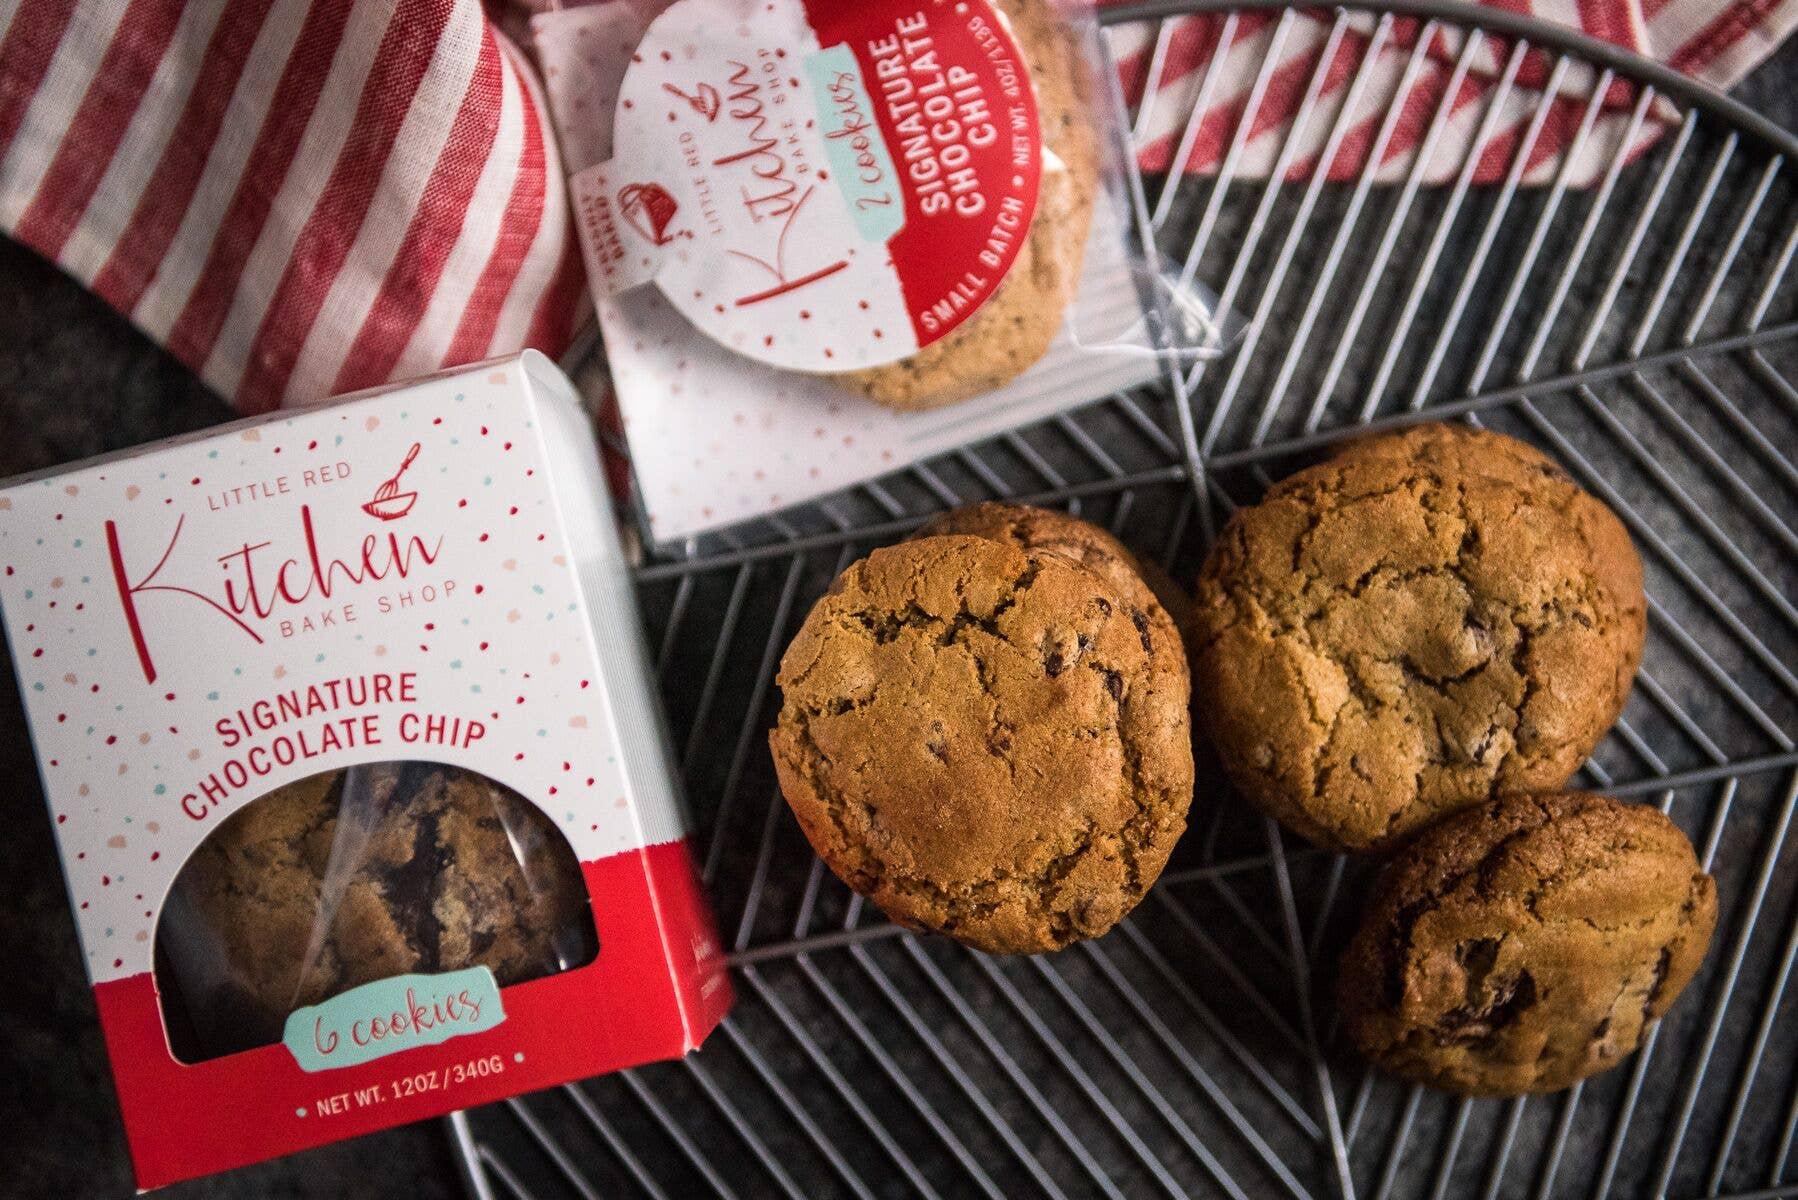 12 oz Signature Chocolate Chip | Trada Marketplace